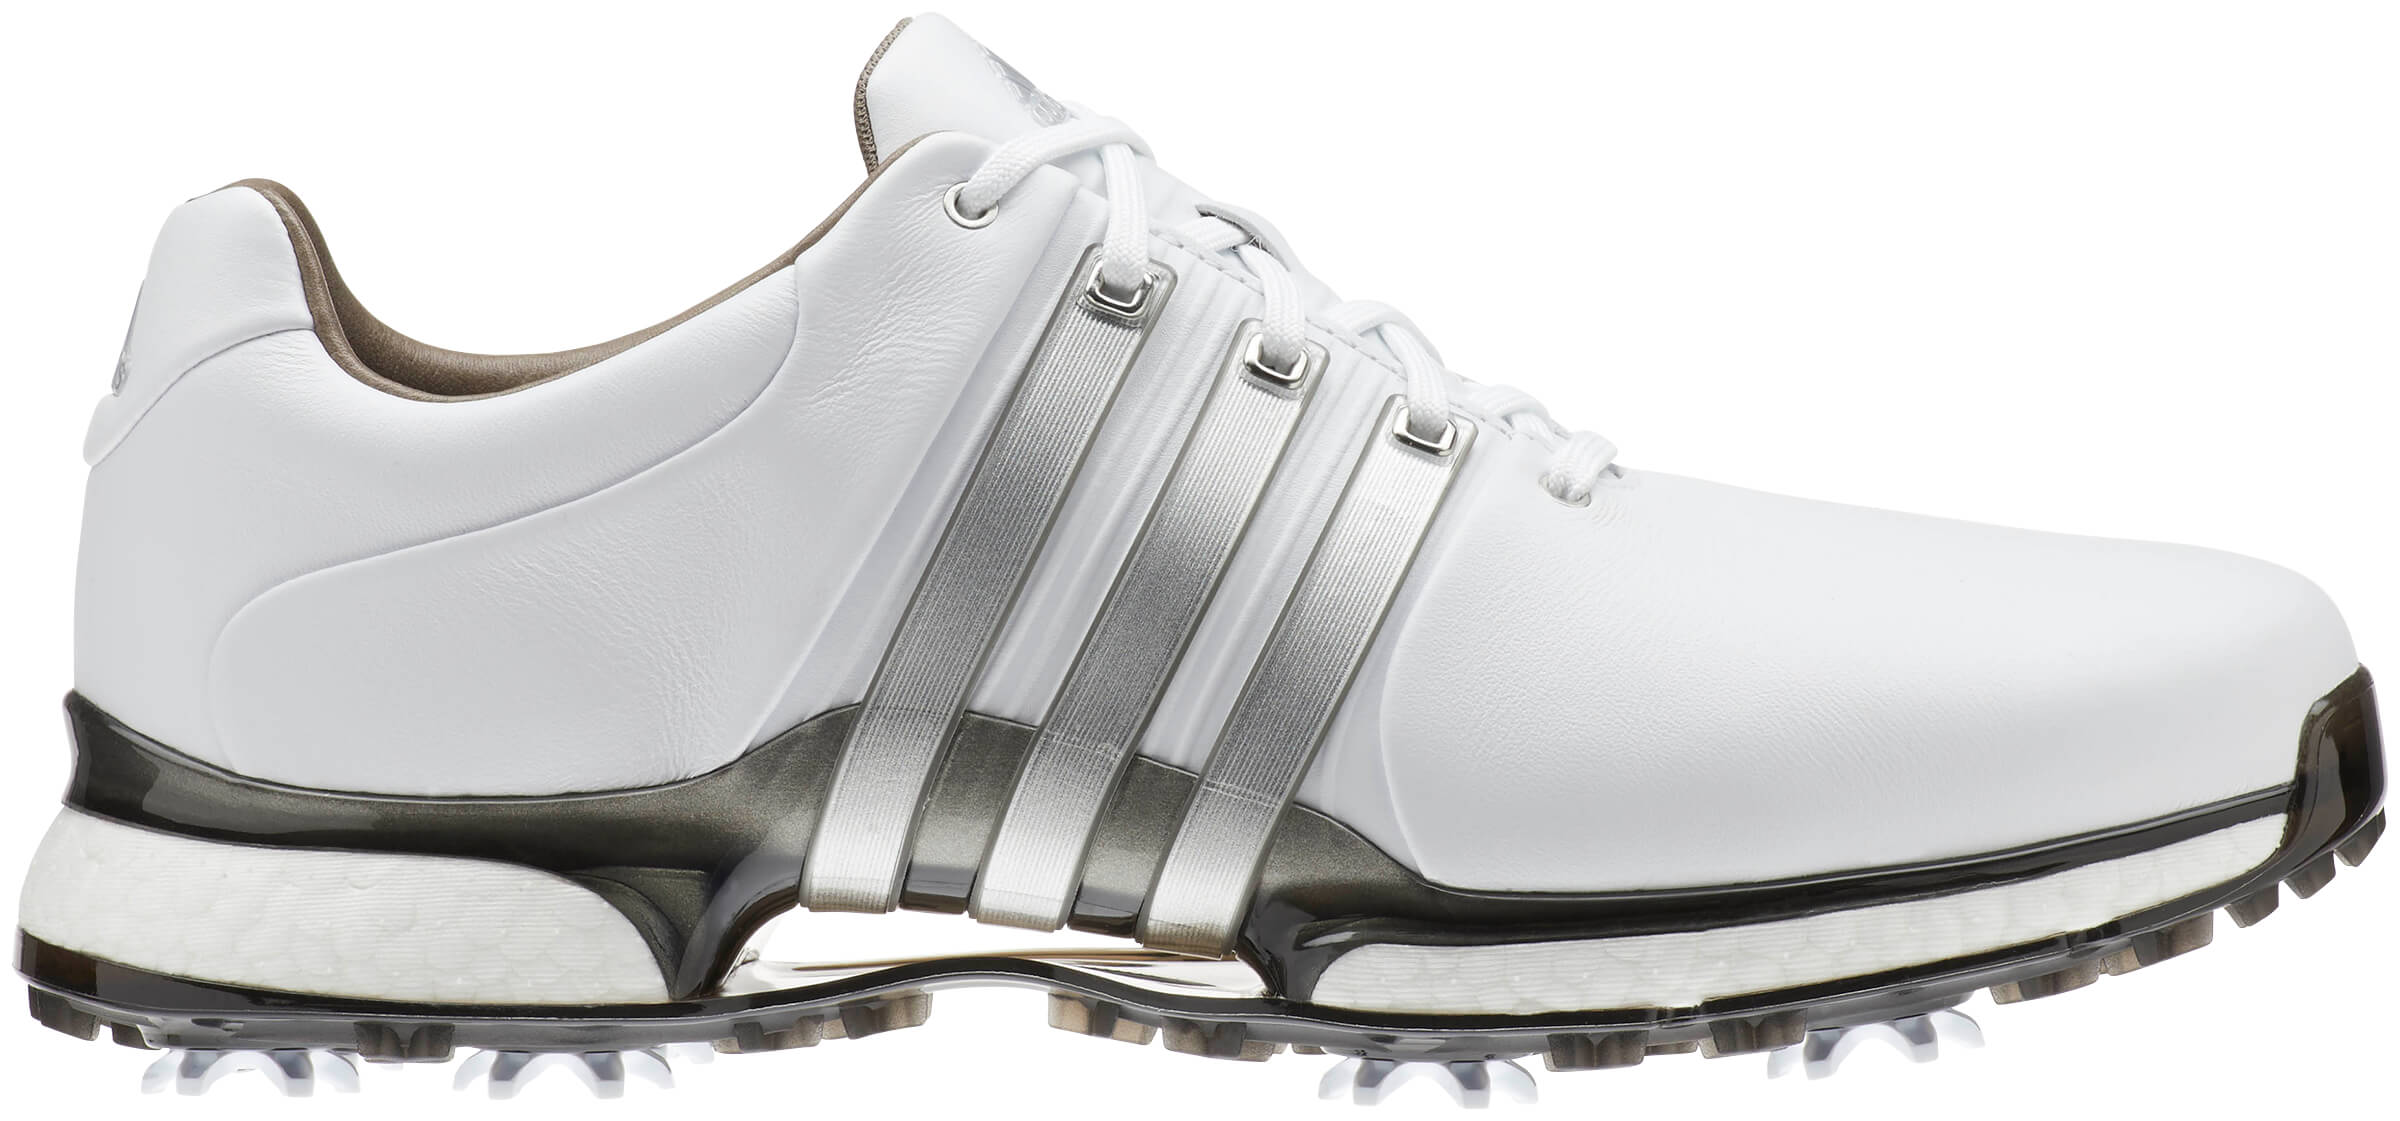 Details about Adidas Tour 360 XT Golf Shoes White/Silver Men\u0027s 2019 Boost  New , Choose Size!